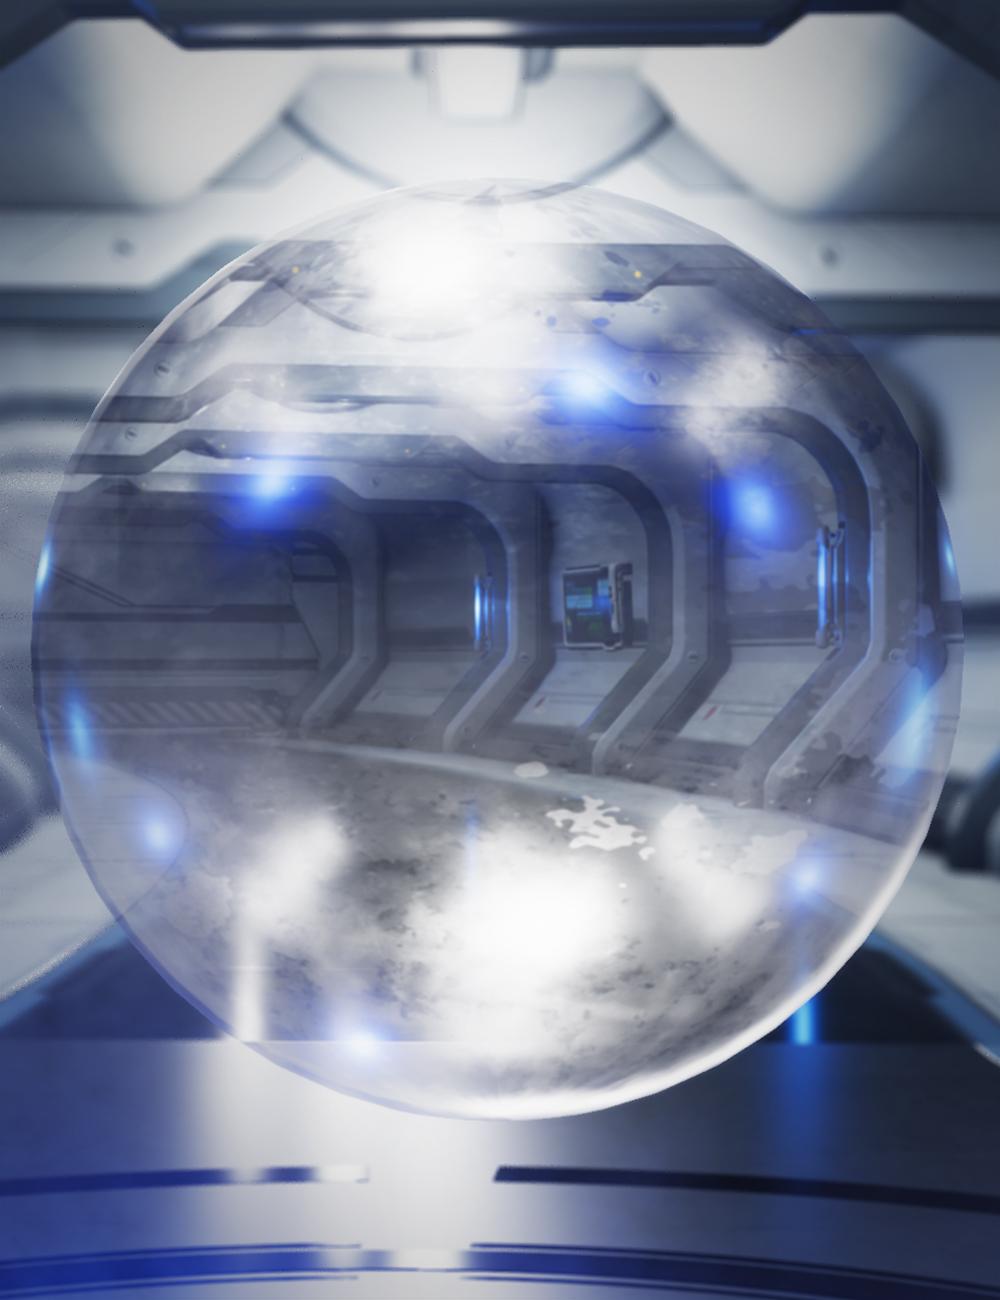 Glass for Filament by: KindredArts, 3D Models by Daz 3D